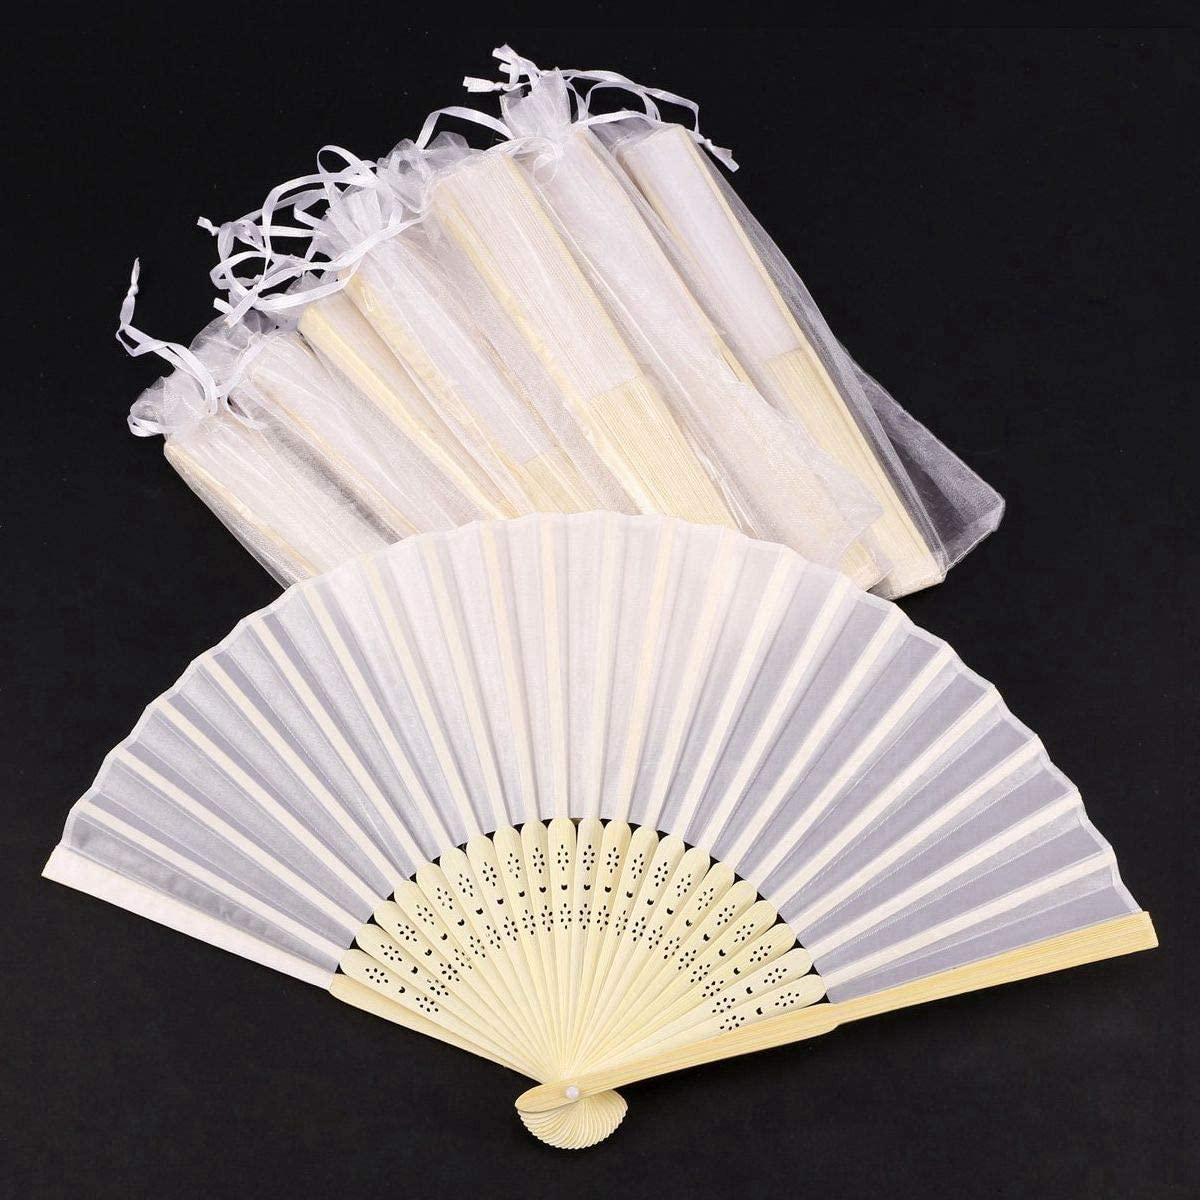 24 Stueck Los Weiss Falten elegante Seide Hand Fan mit Geschenktuete Hochze 1I